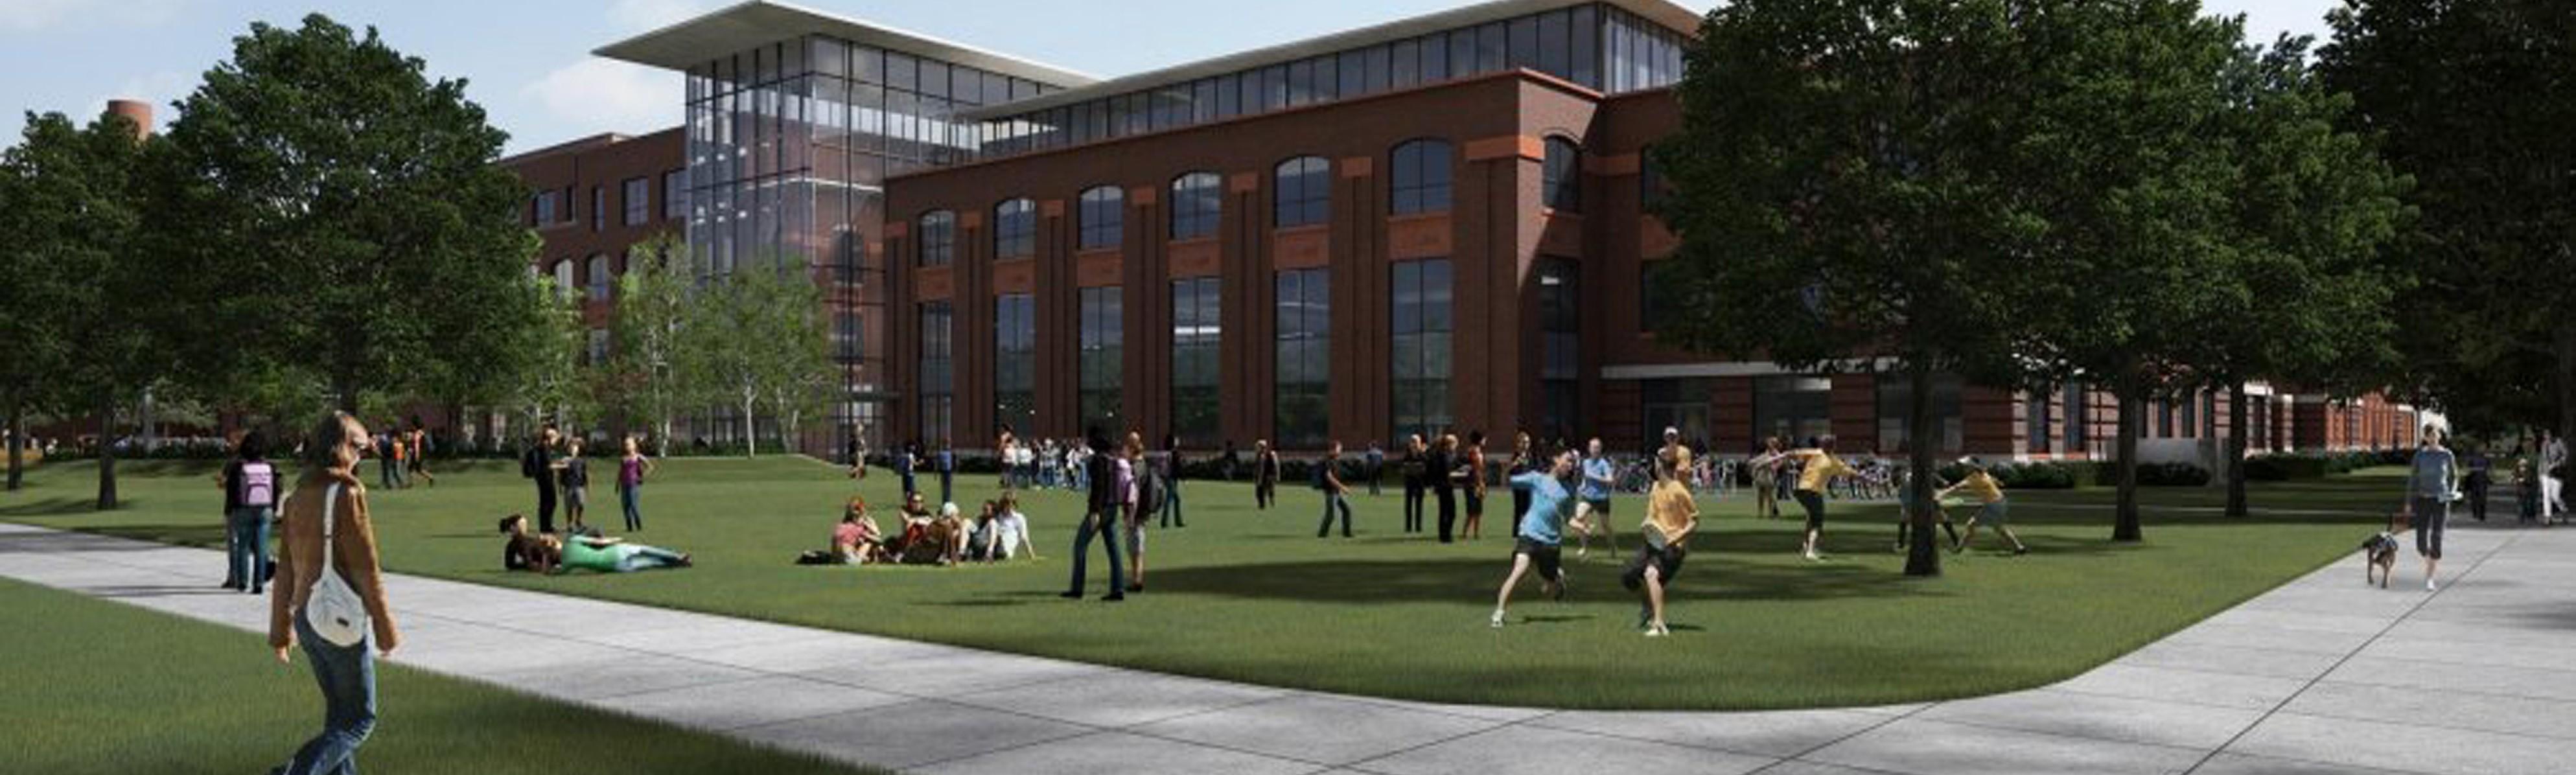 New Trier Summer School 2020.New Trier Educational Foundation Linkedin